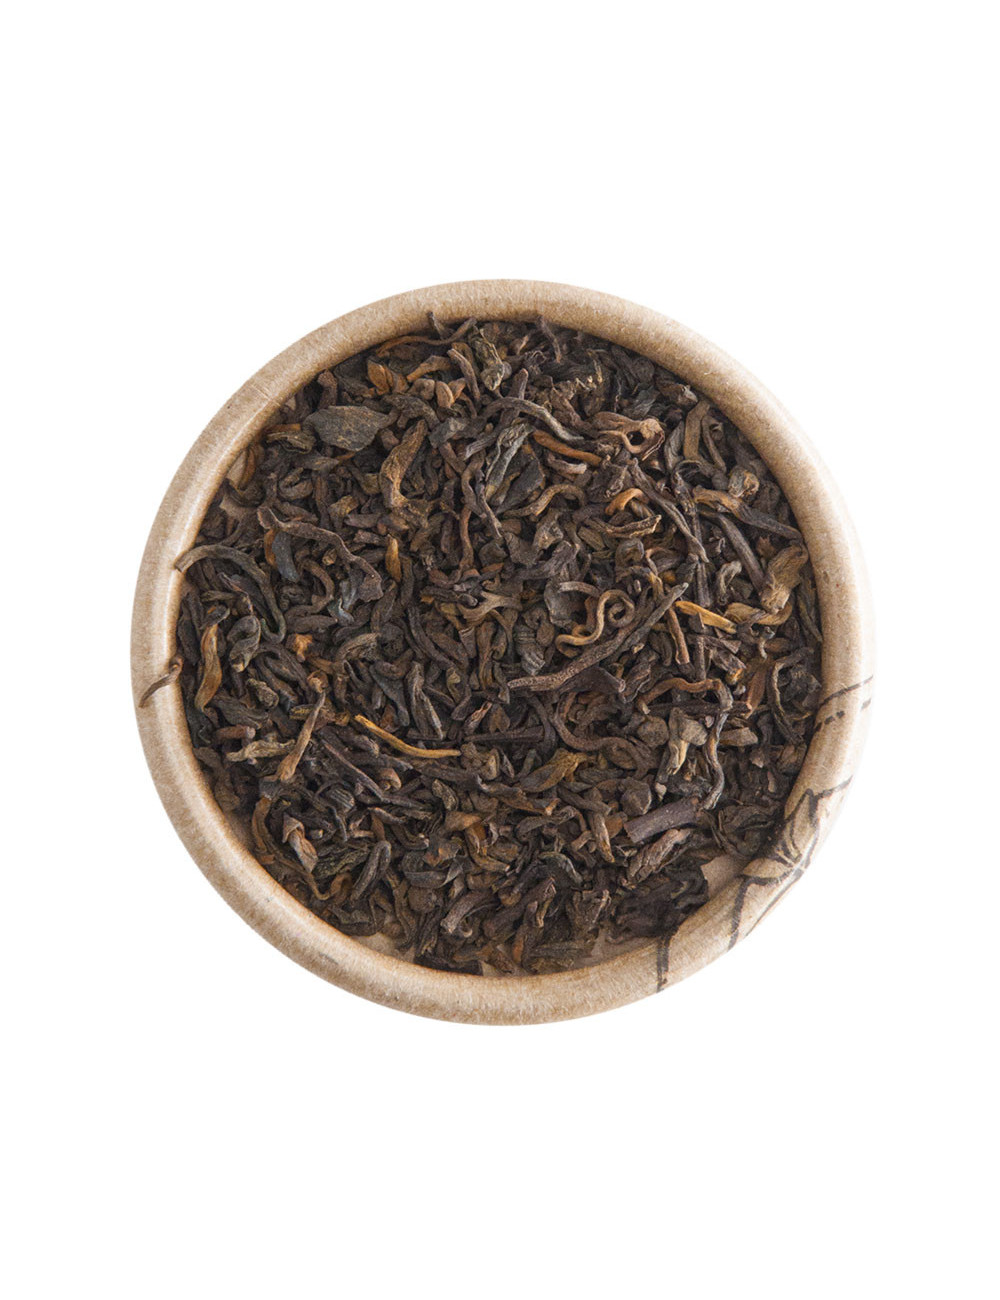 Pu-erh Special Yunnan tè nero - La Pianta del Tè shop online